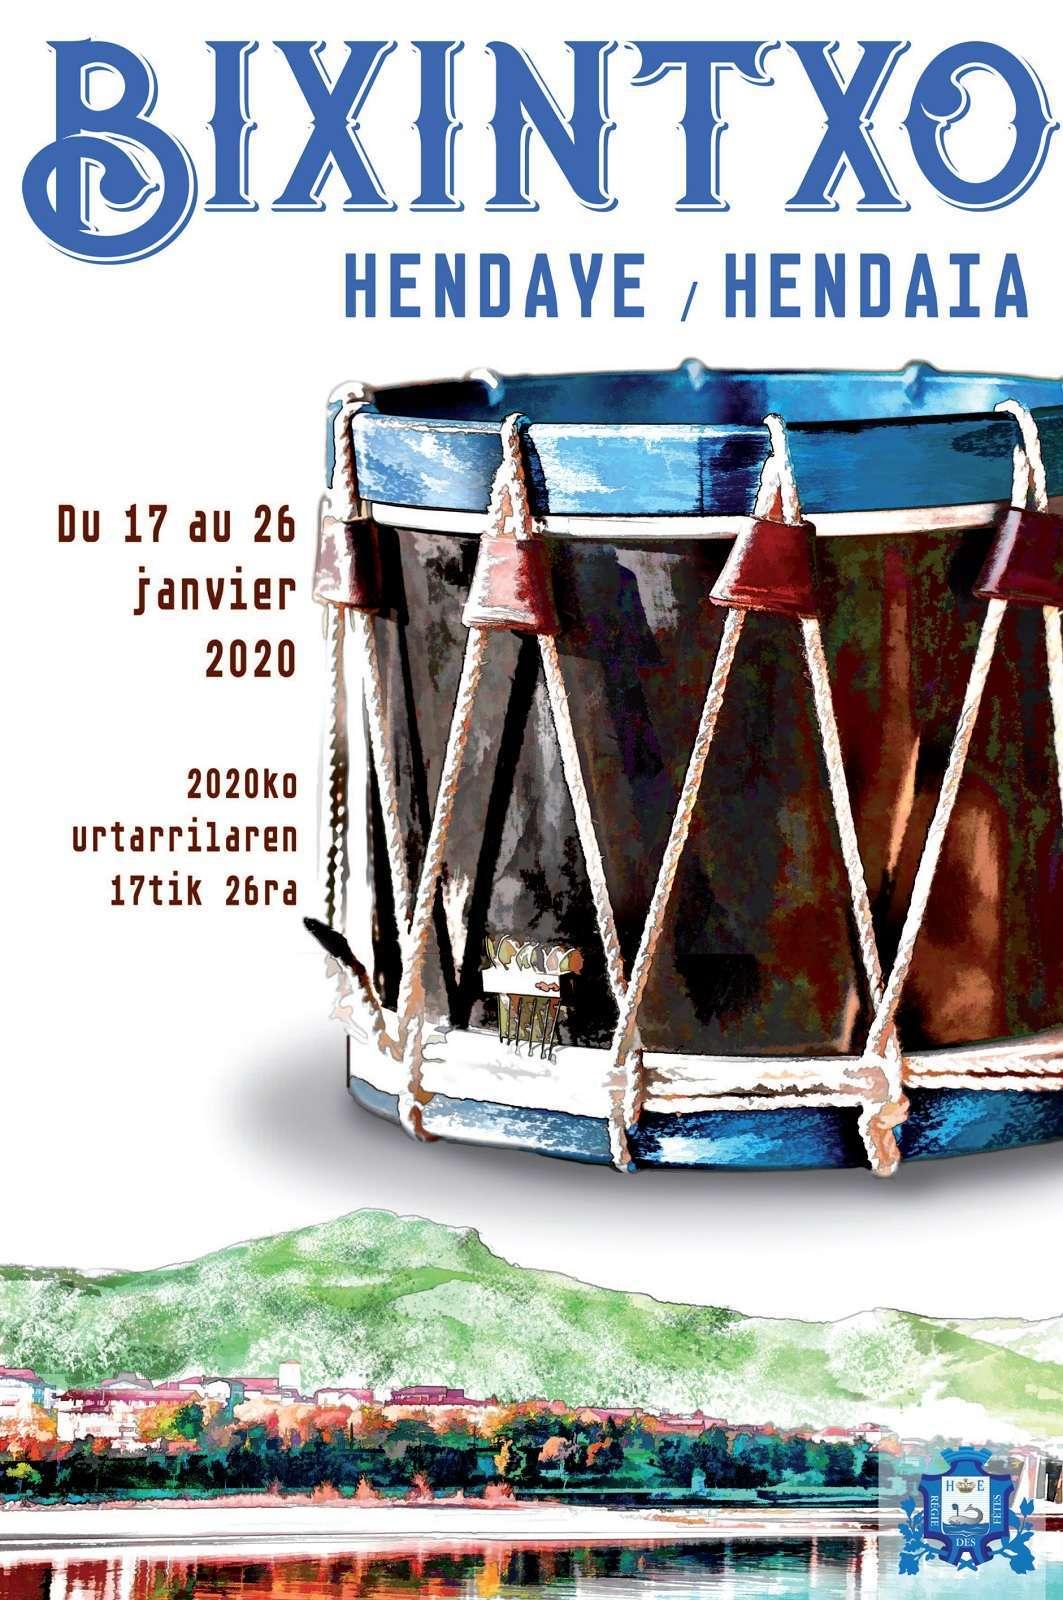 bixintxo_hendaia_hendaye_2020